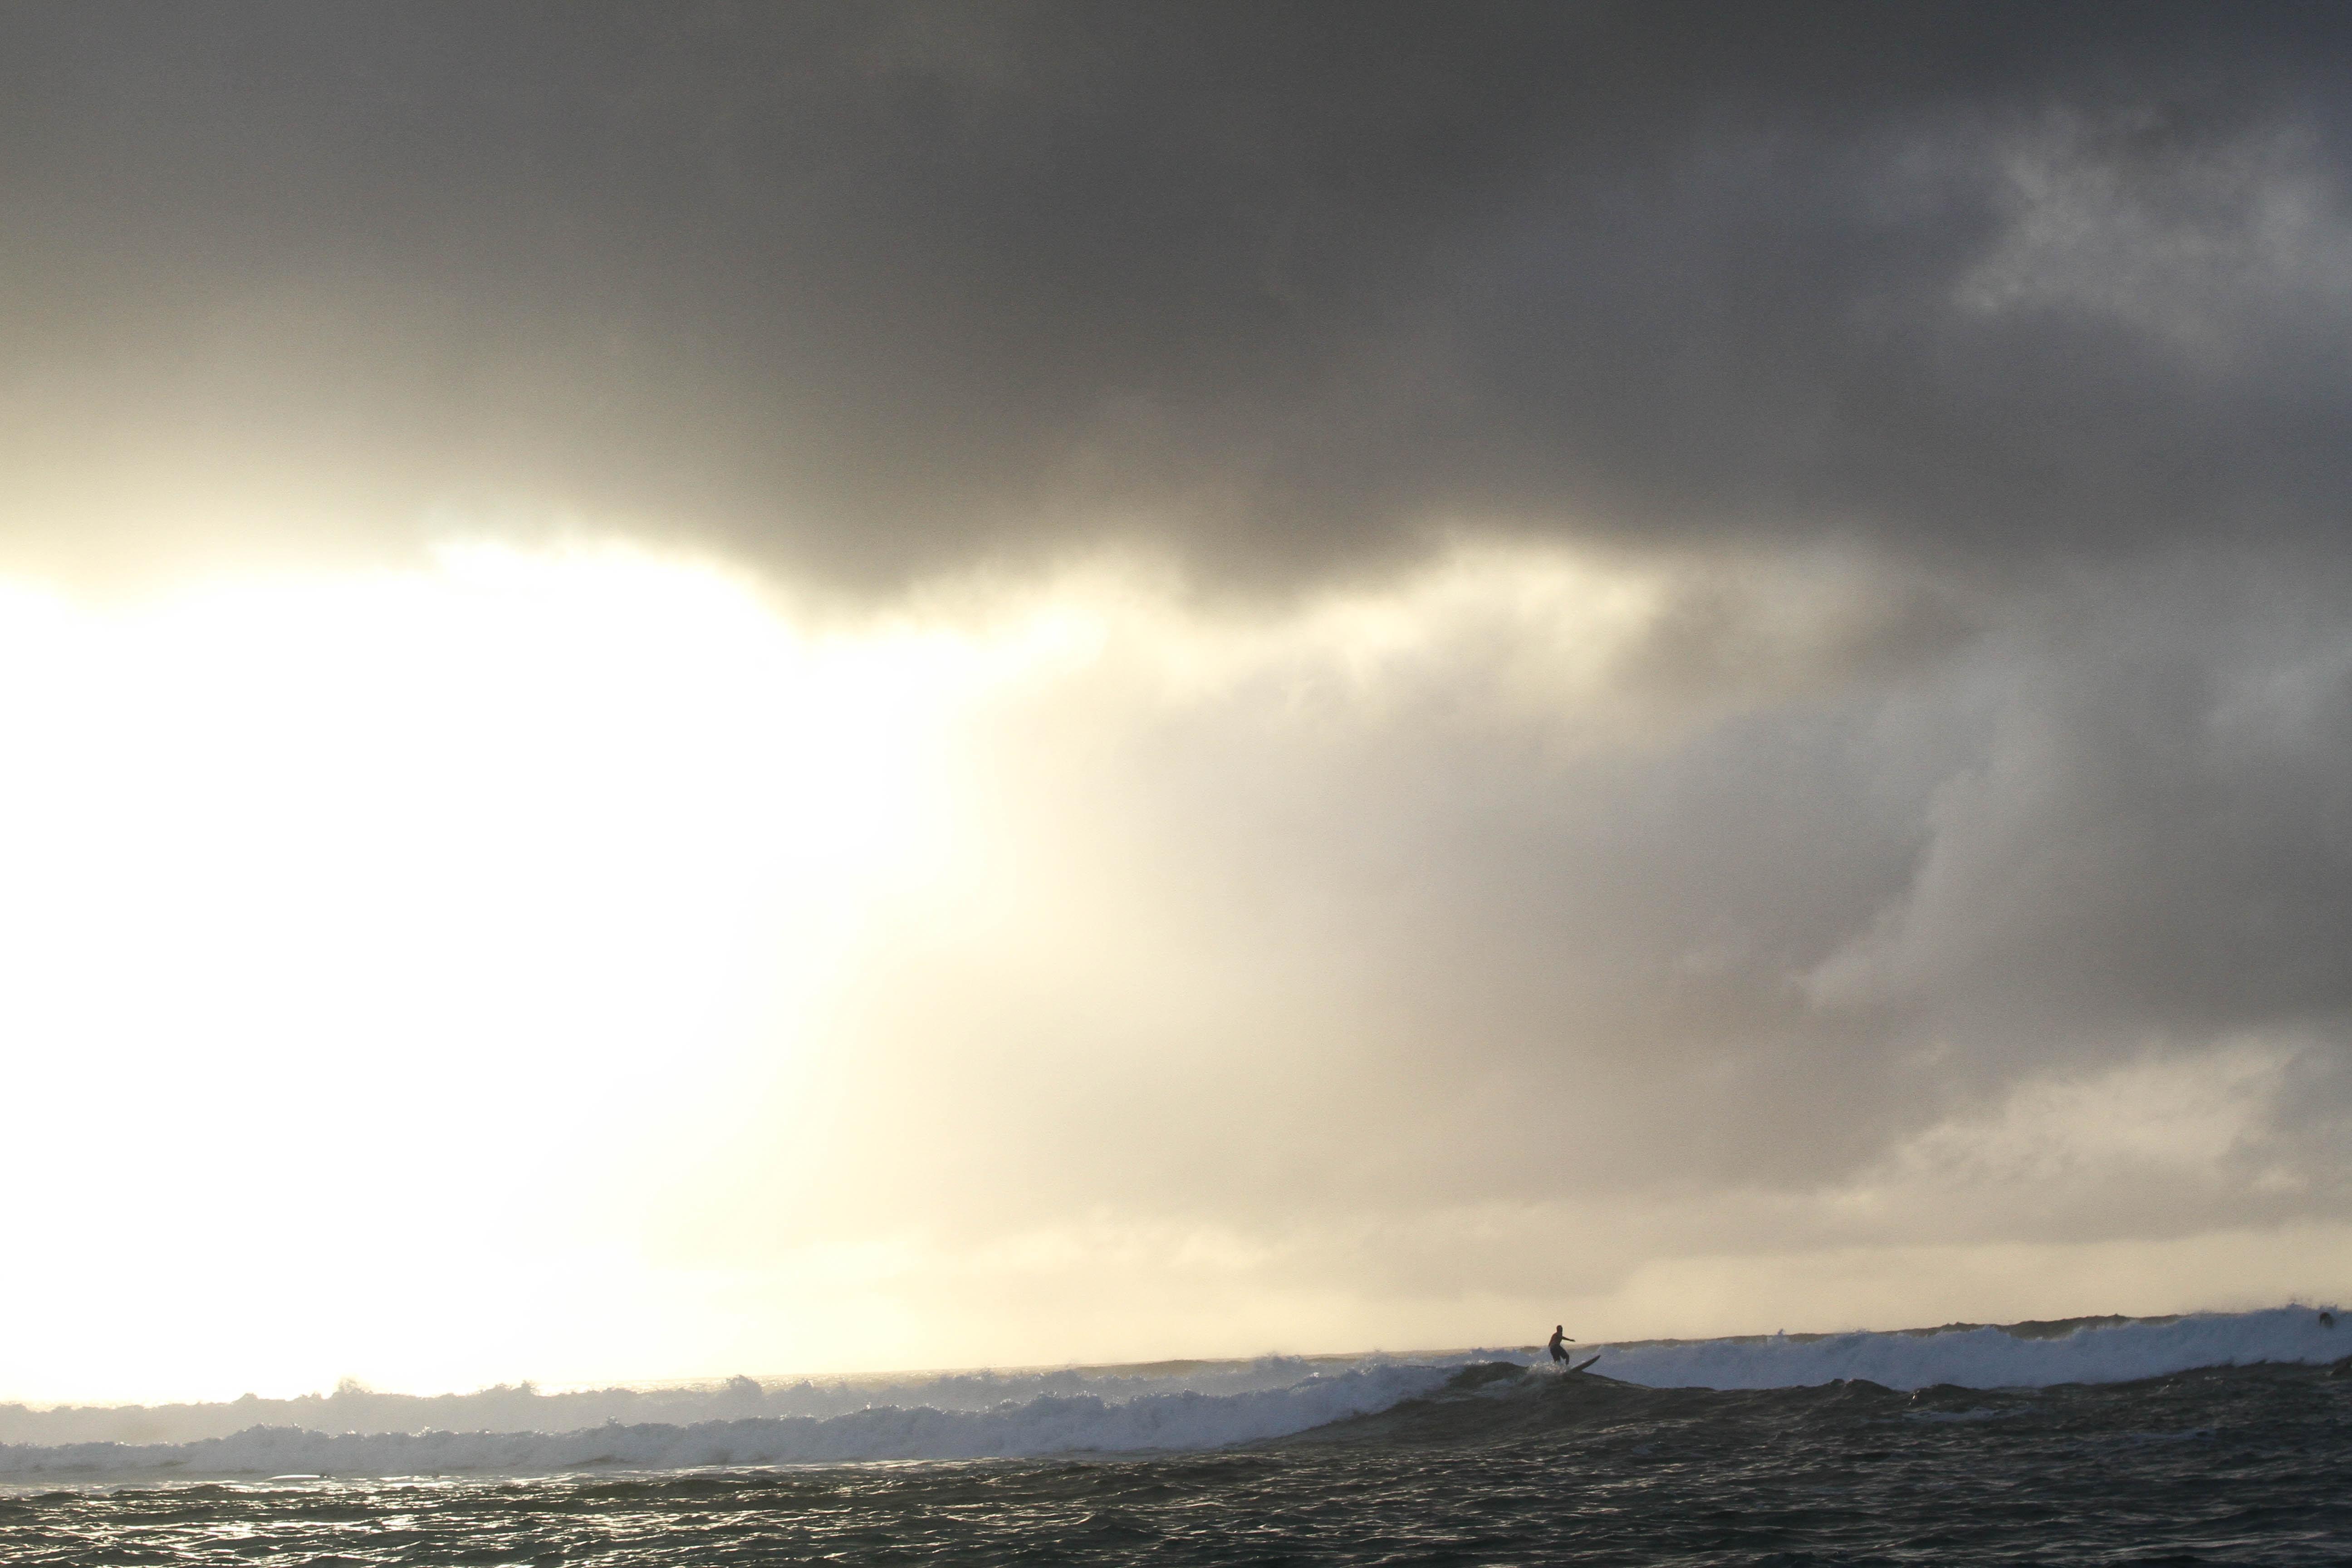 Sunrise coming through dark clouds.